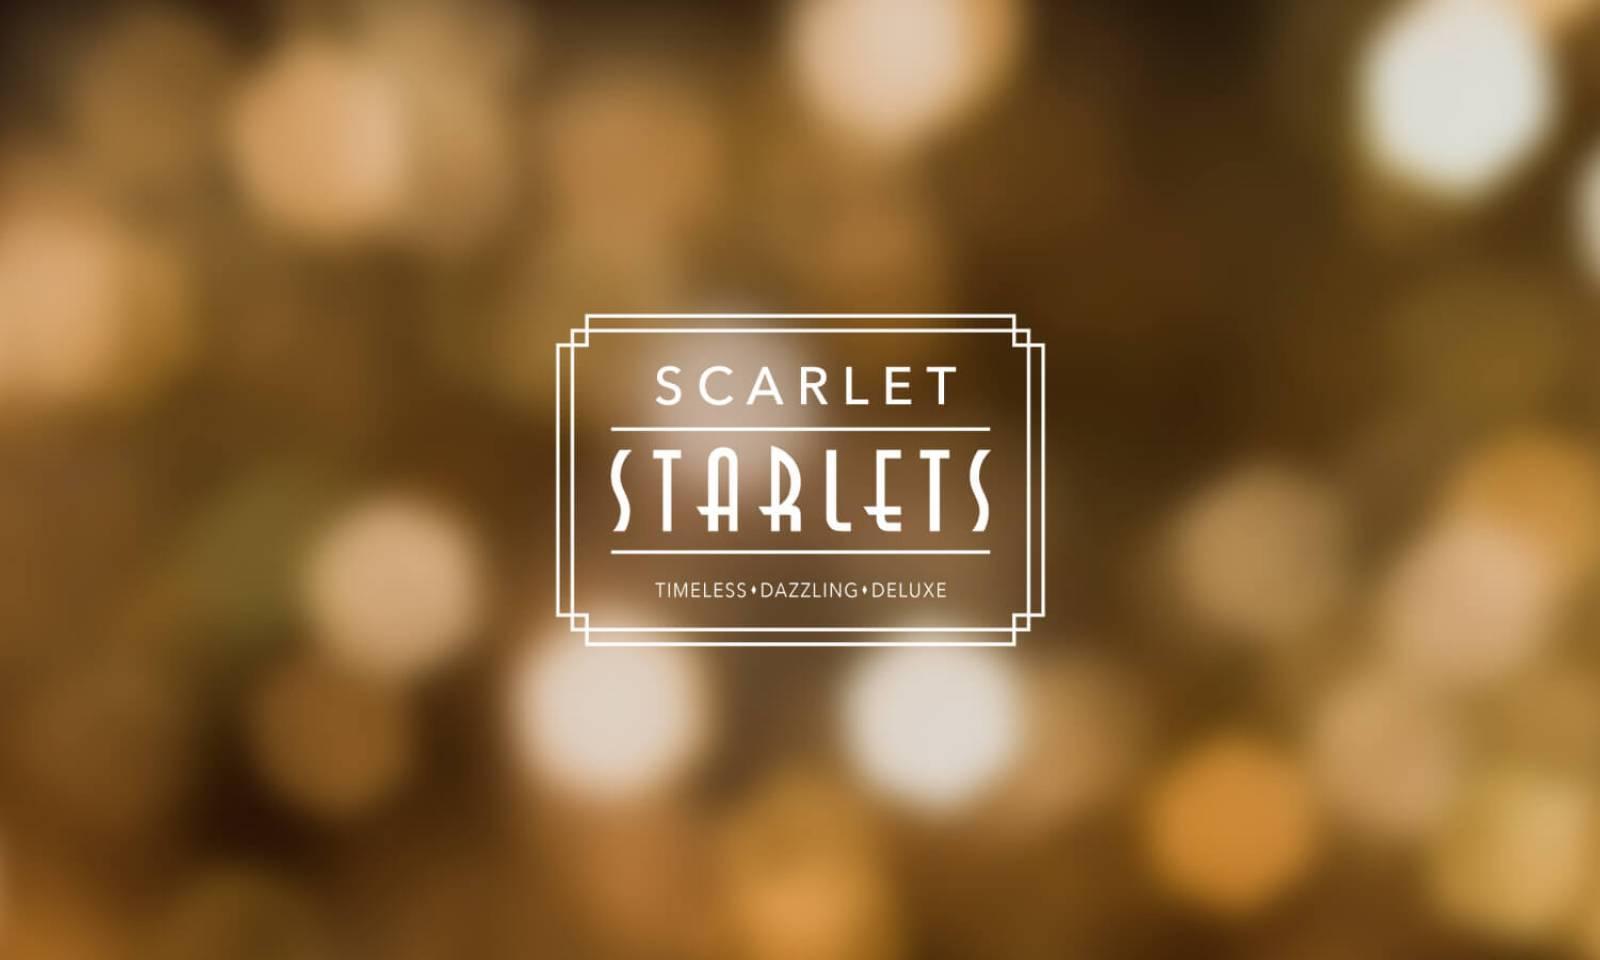 logo-Scarlet-corporate-identity-agency-graphic-design-canterbury.jpg